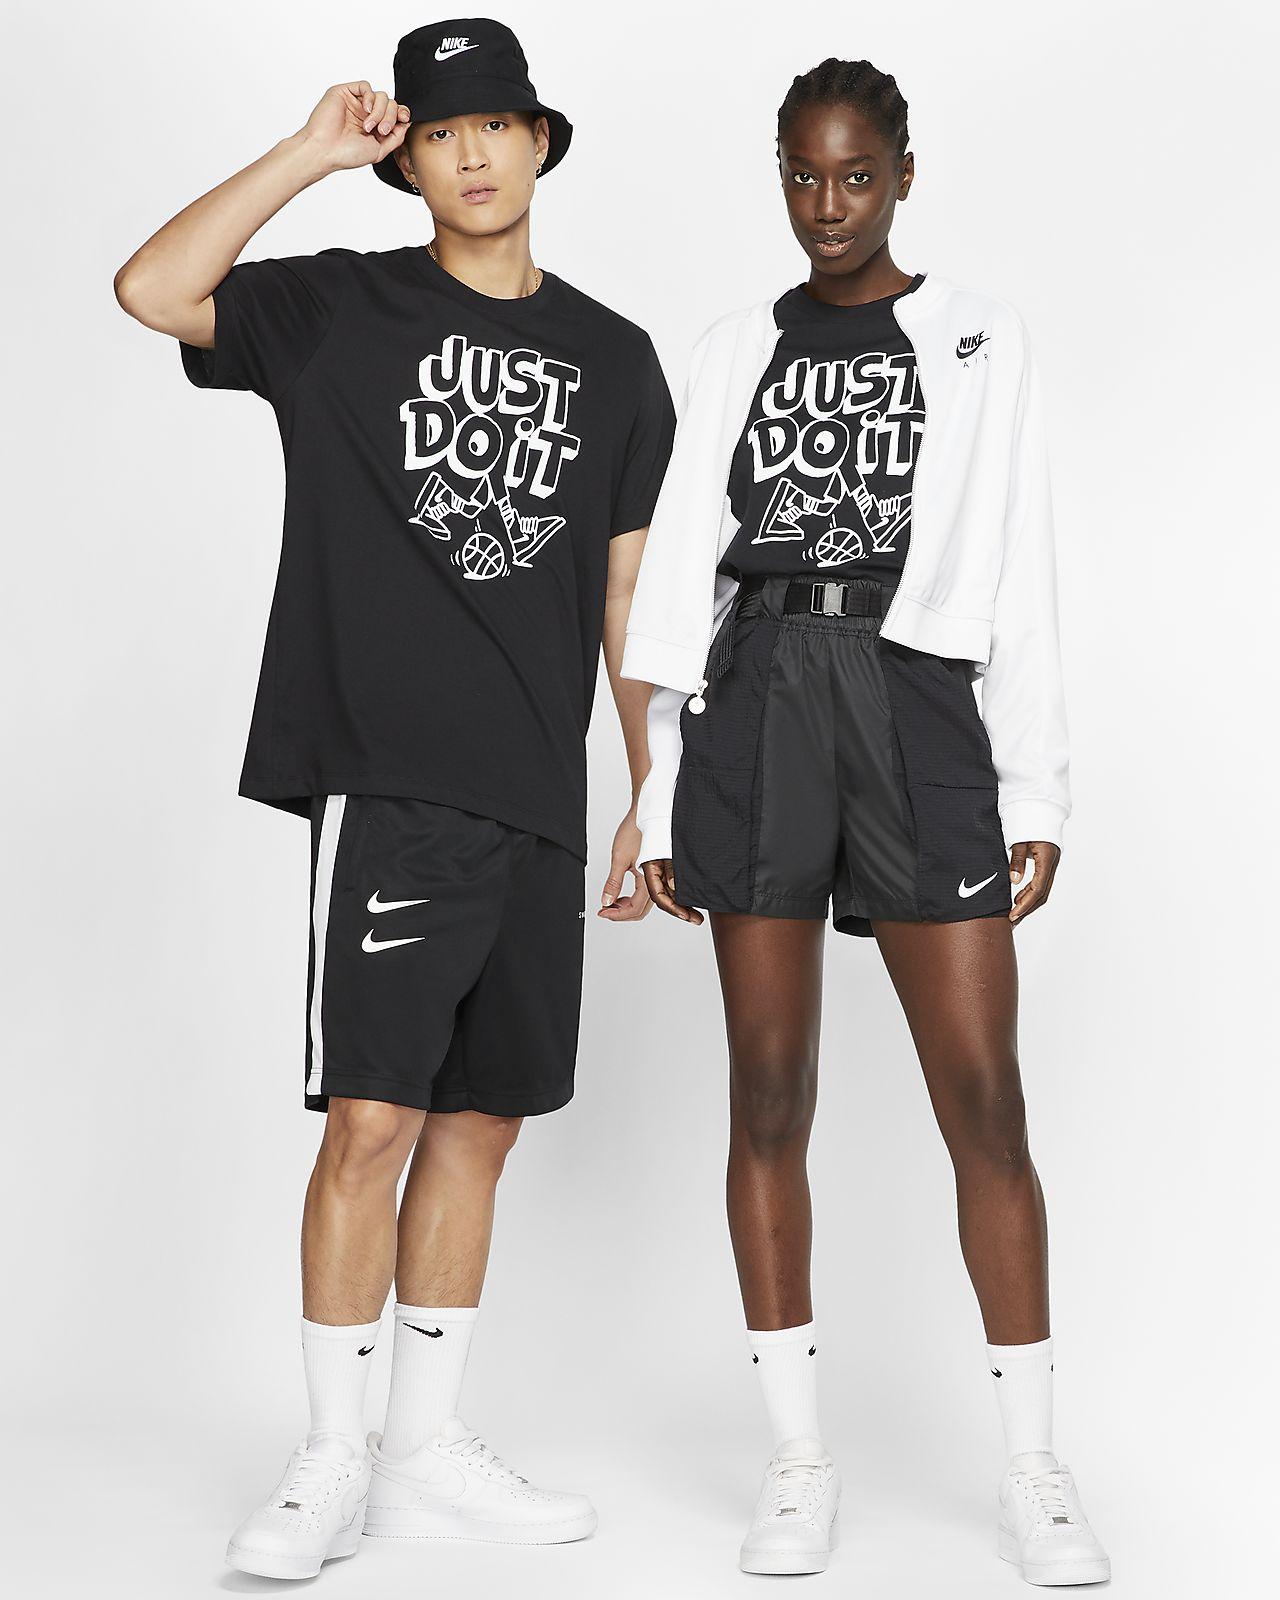 Nike Dri FIT Just Do It Basketball T Shirt